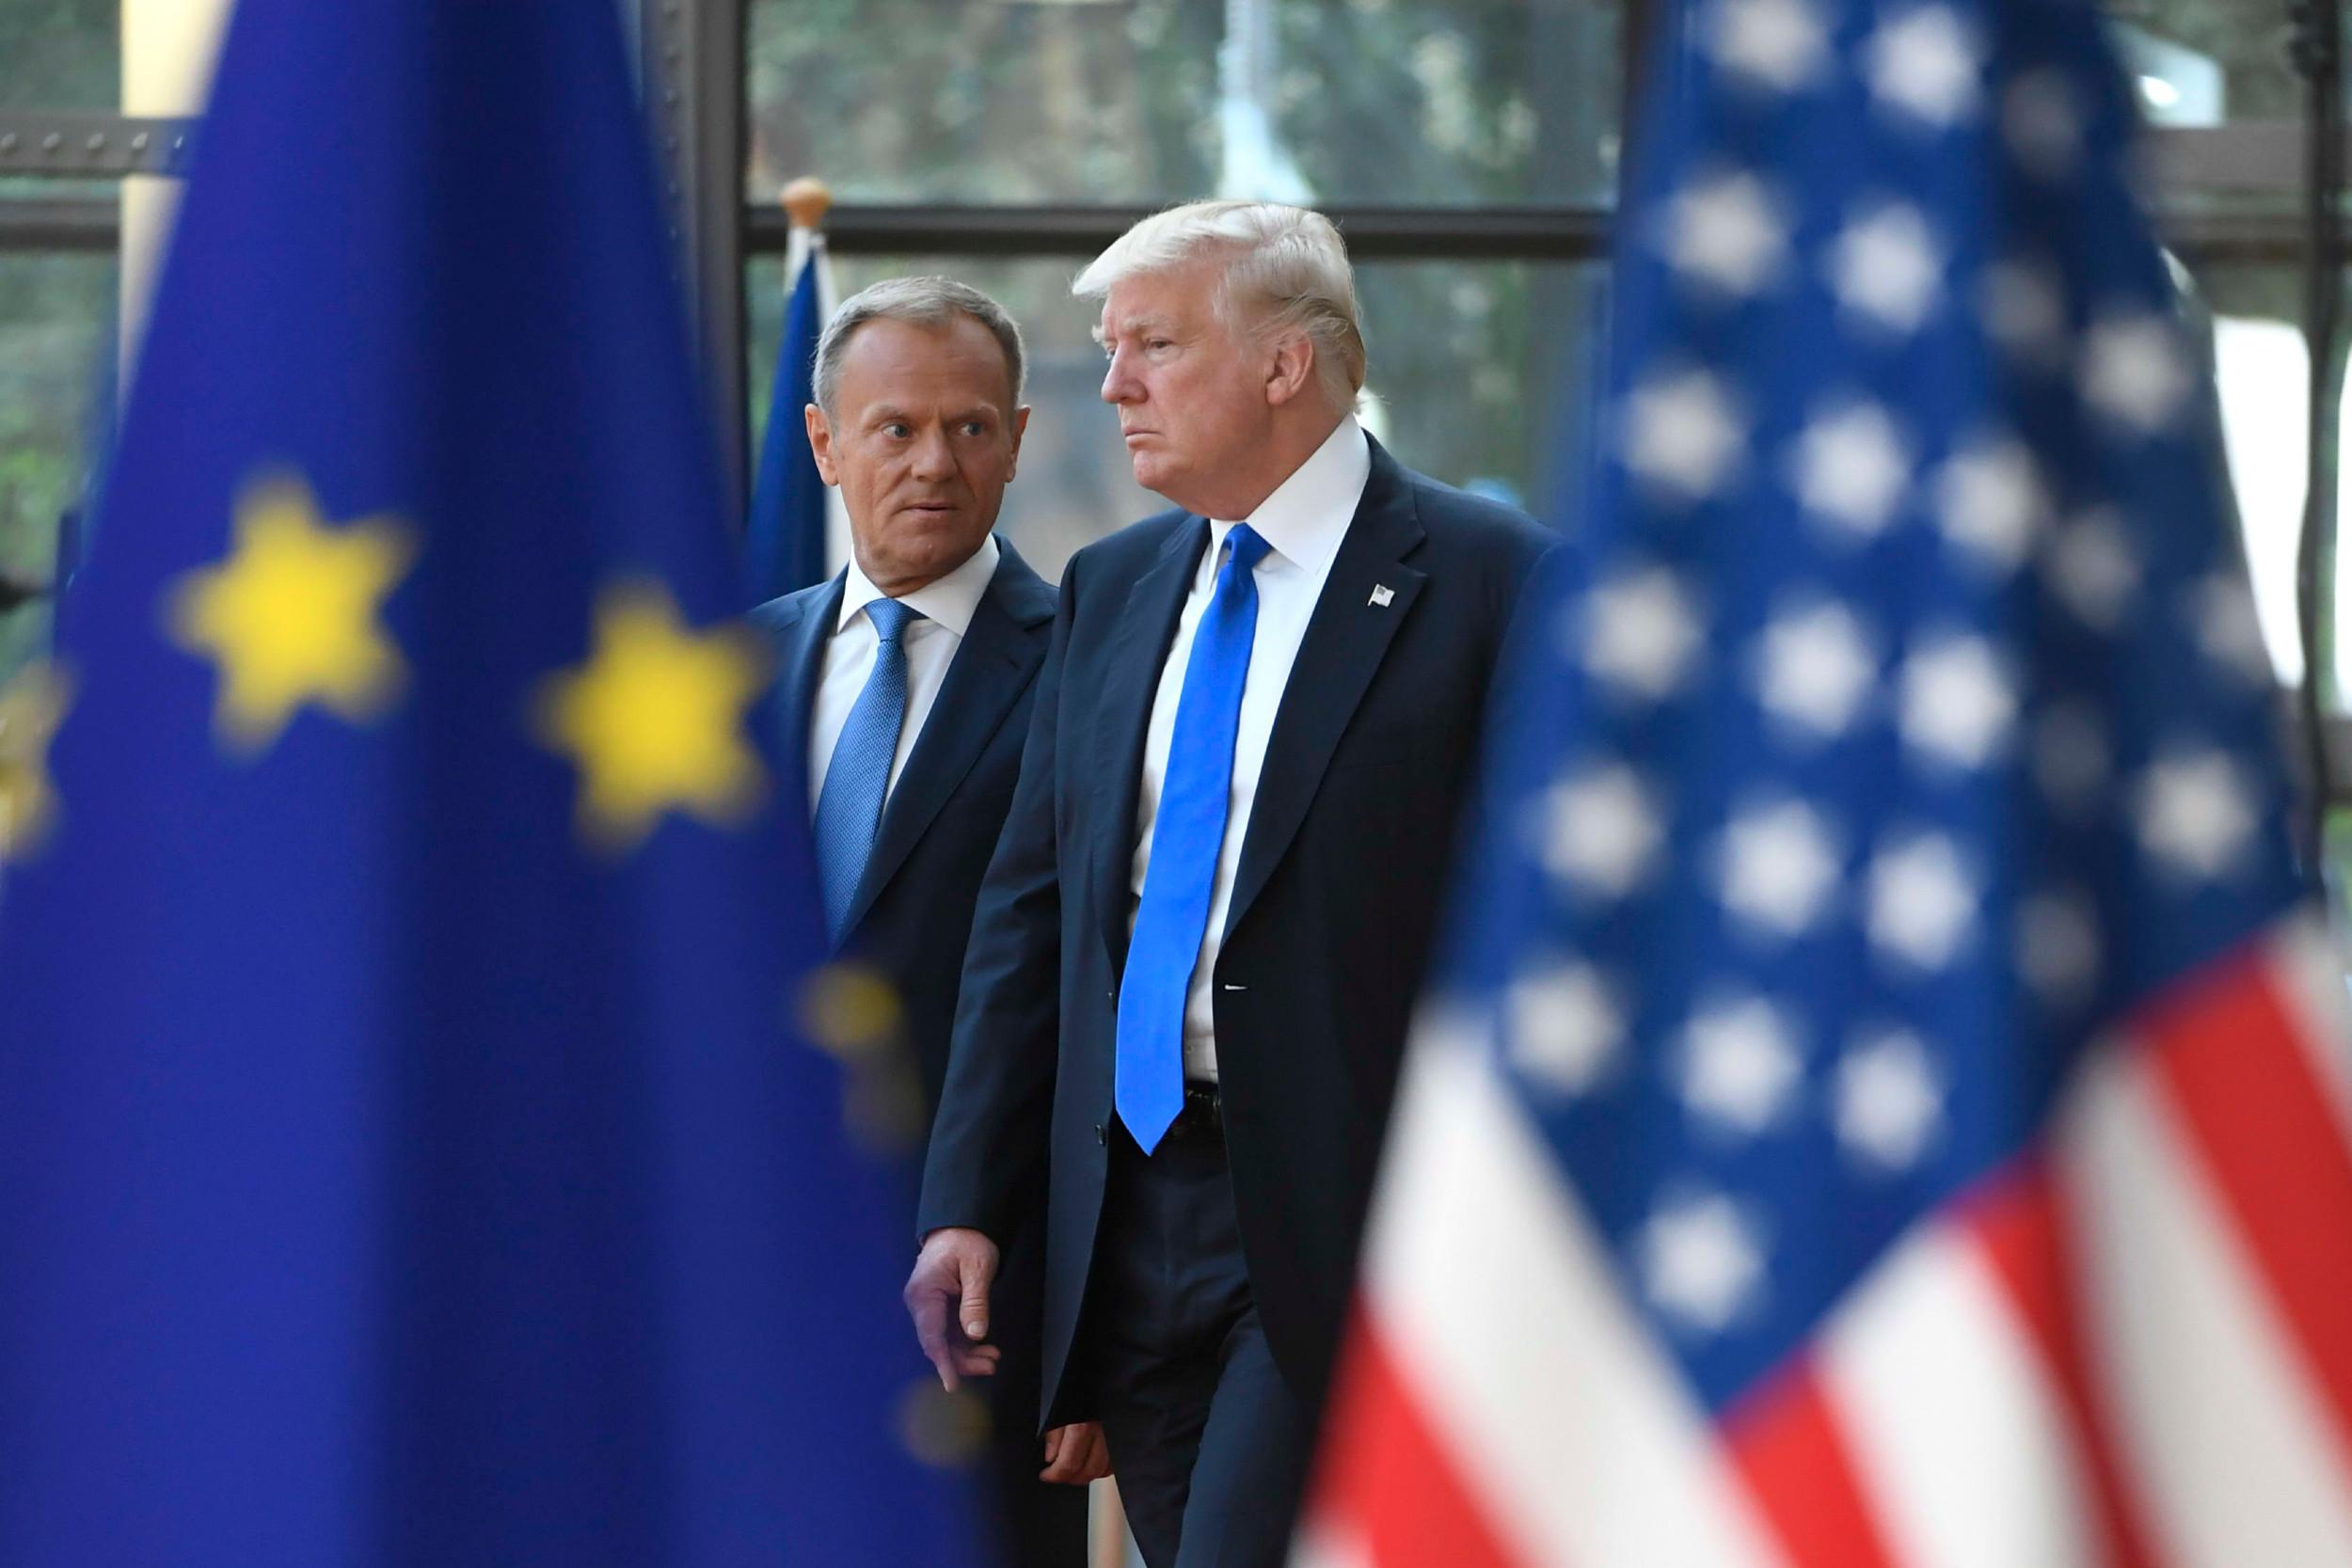 Председник Европског савета Доналд Туск и амерички председник Доналд Трамп разговарају у седишту ЕУ, Брисел, 25. мај 2017. (Фото: Emmanuel Dunand/AFP via Getty Images)